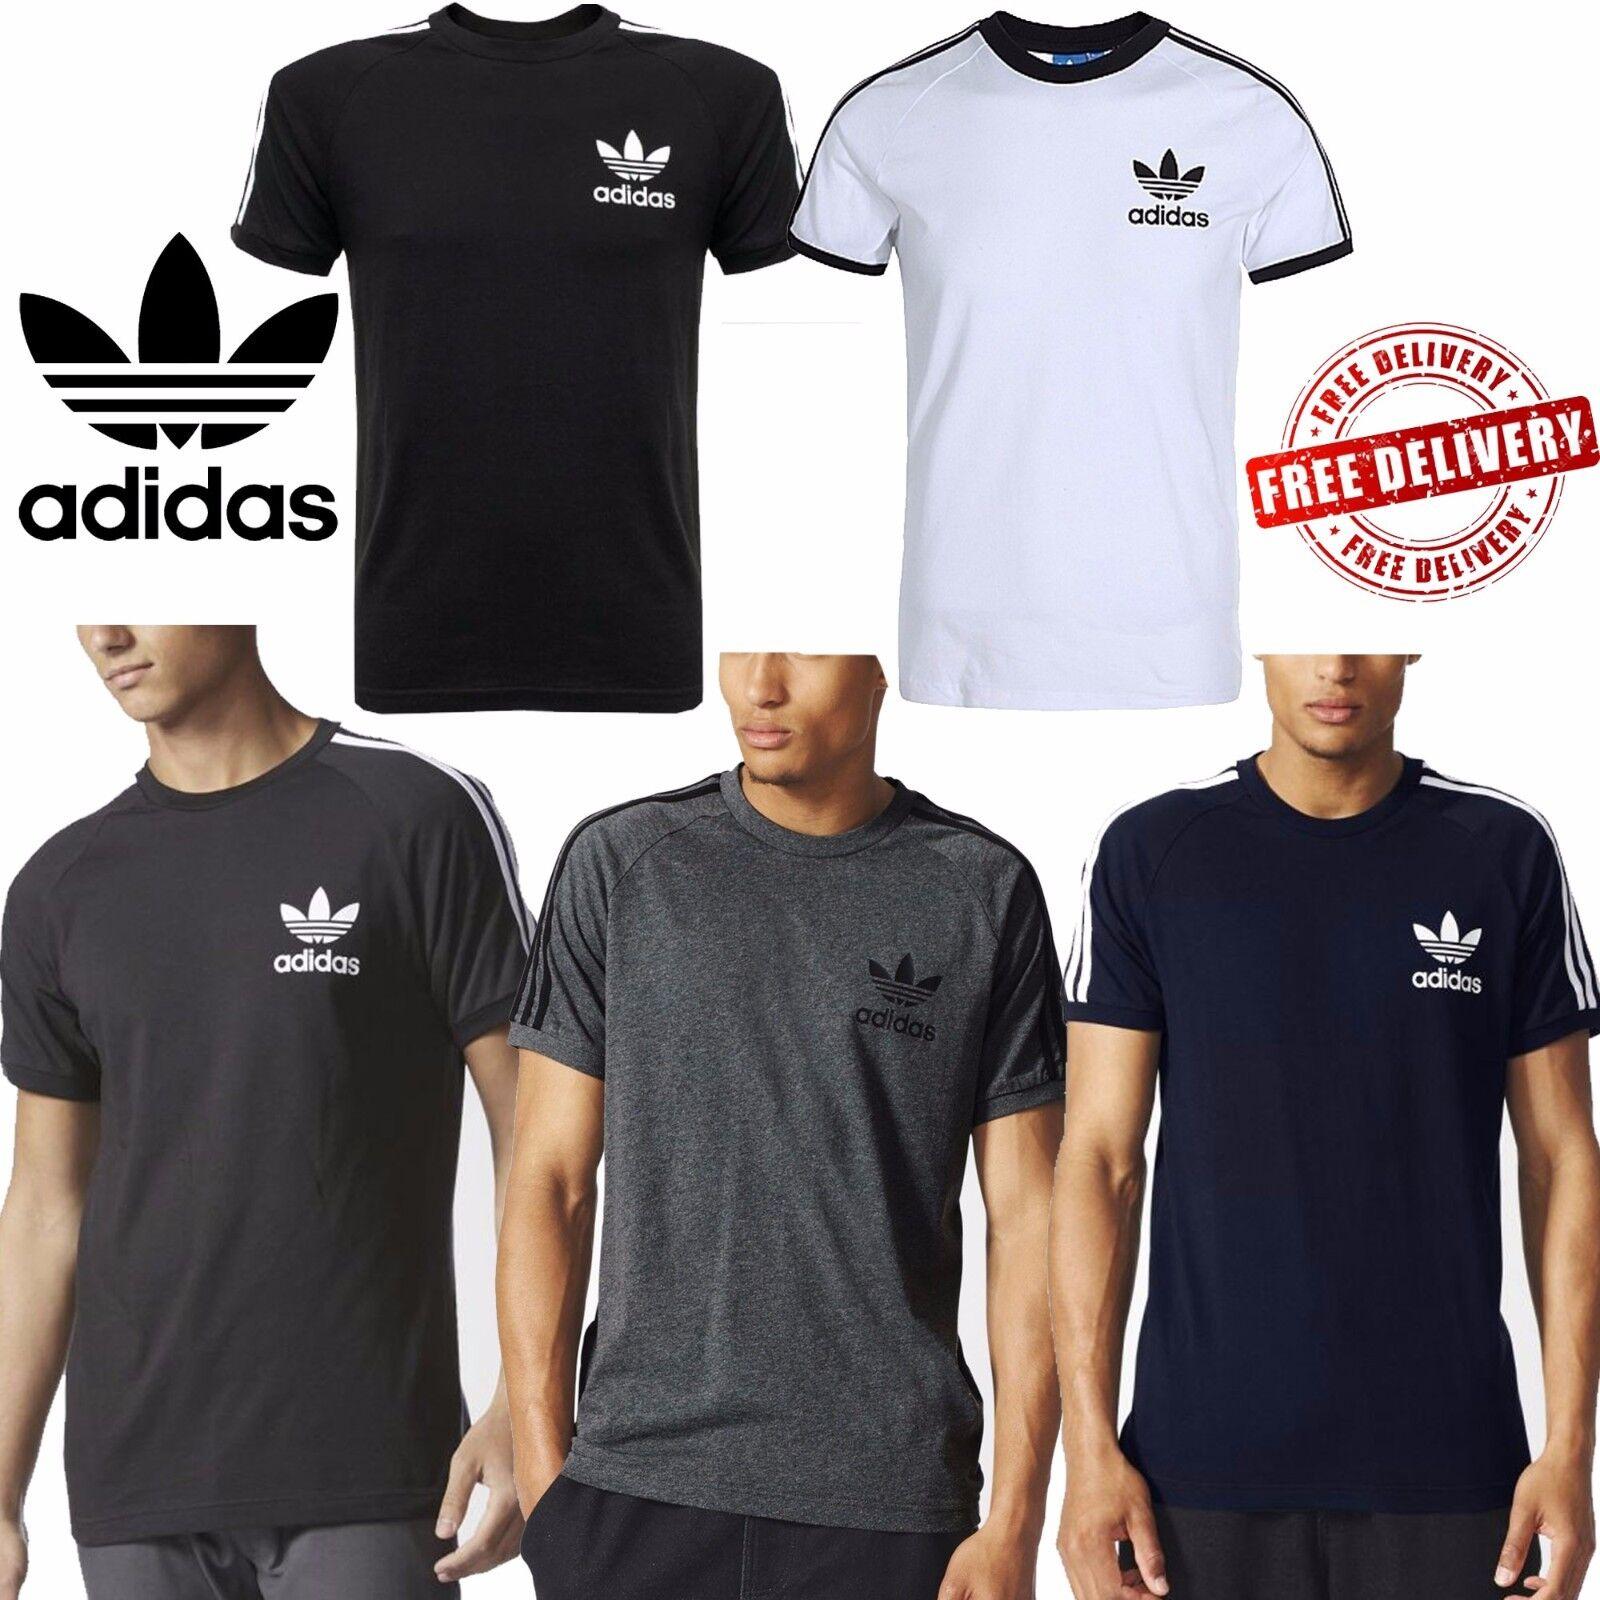 Details zu adidas Mens Original California T Shirts Trefoil Logo Sports 3 Stripes Top Tees